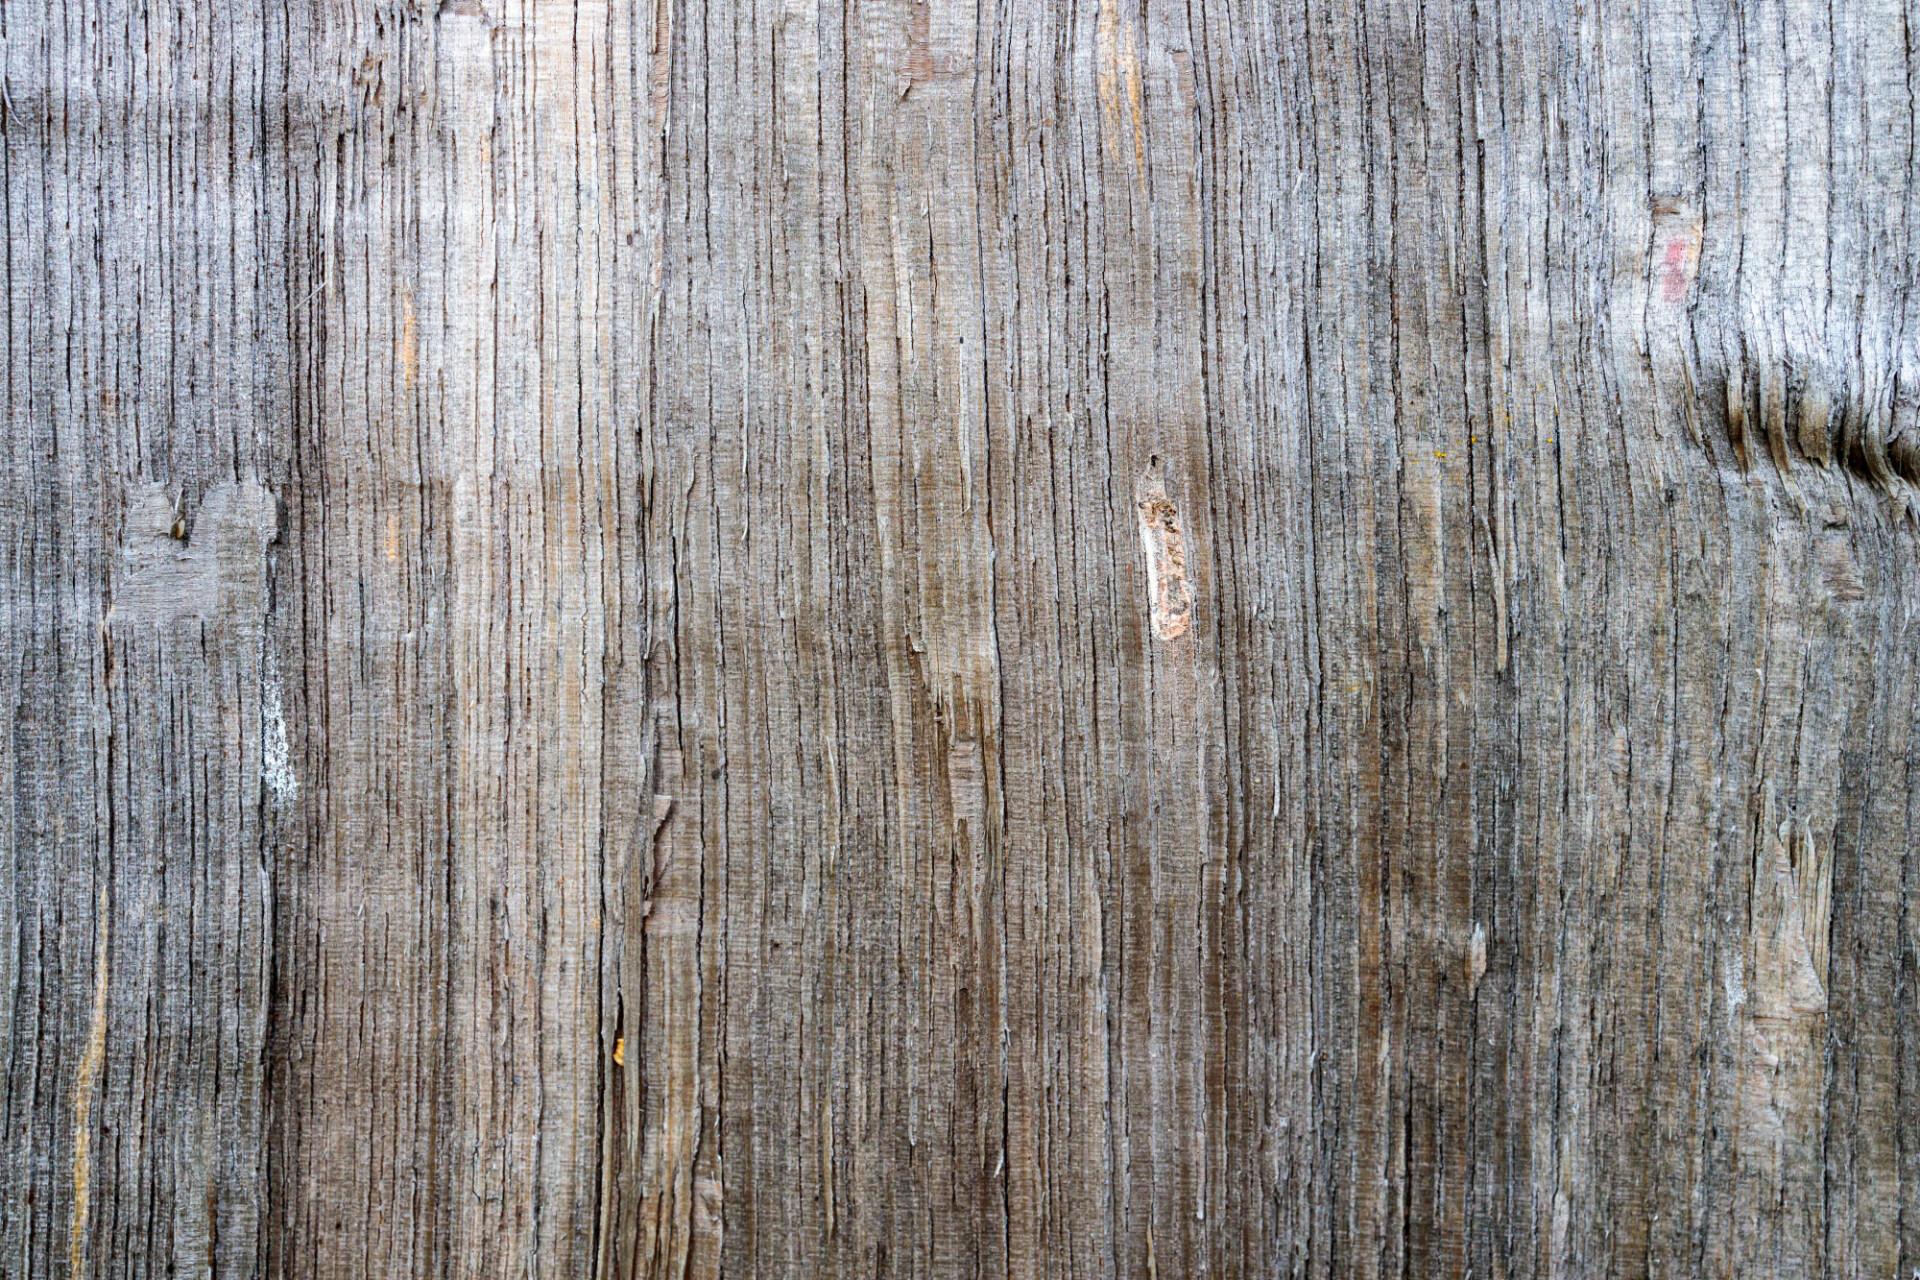 Rough natural wood texture